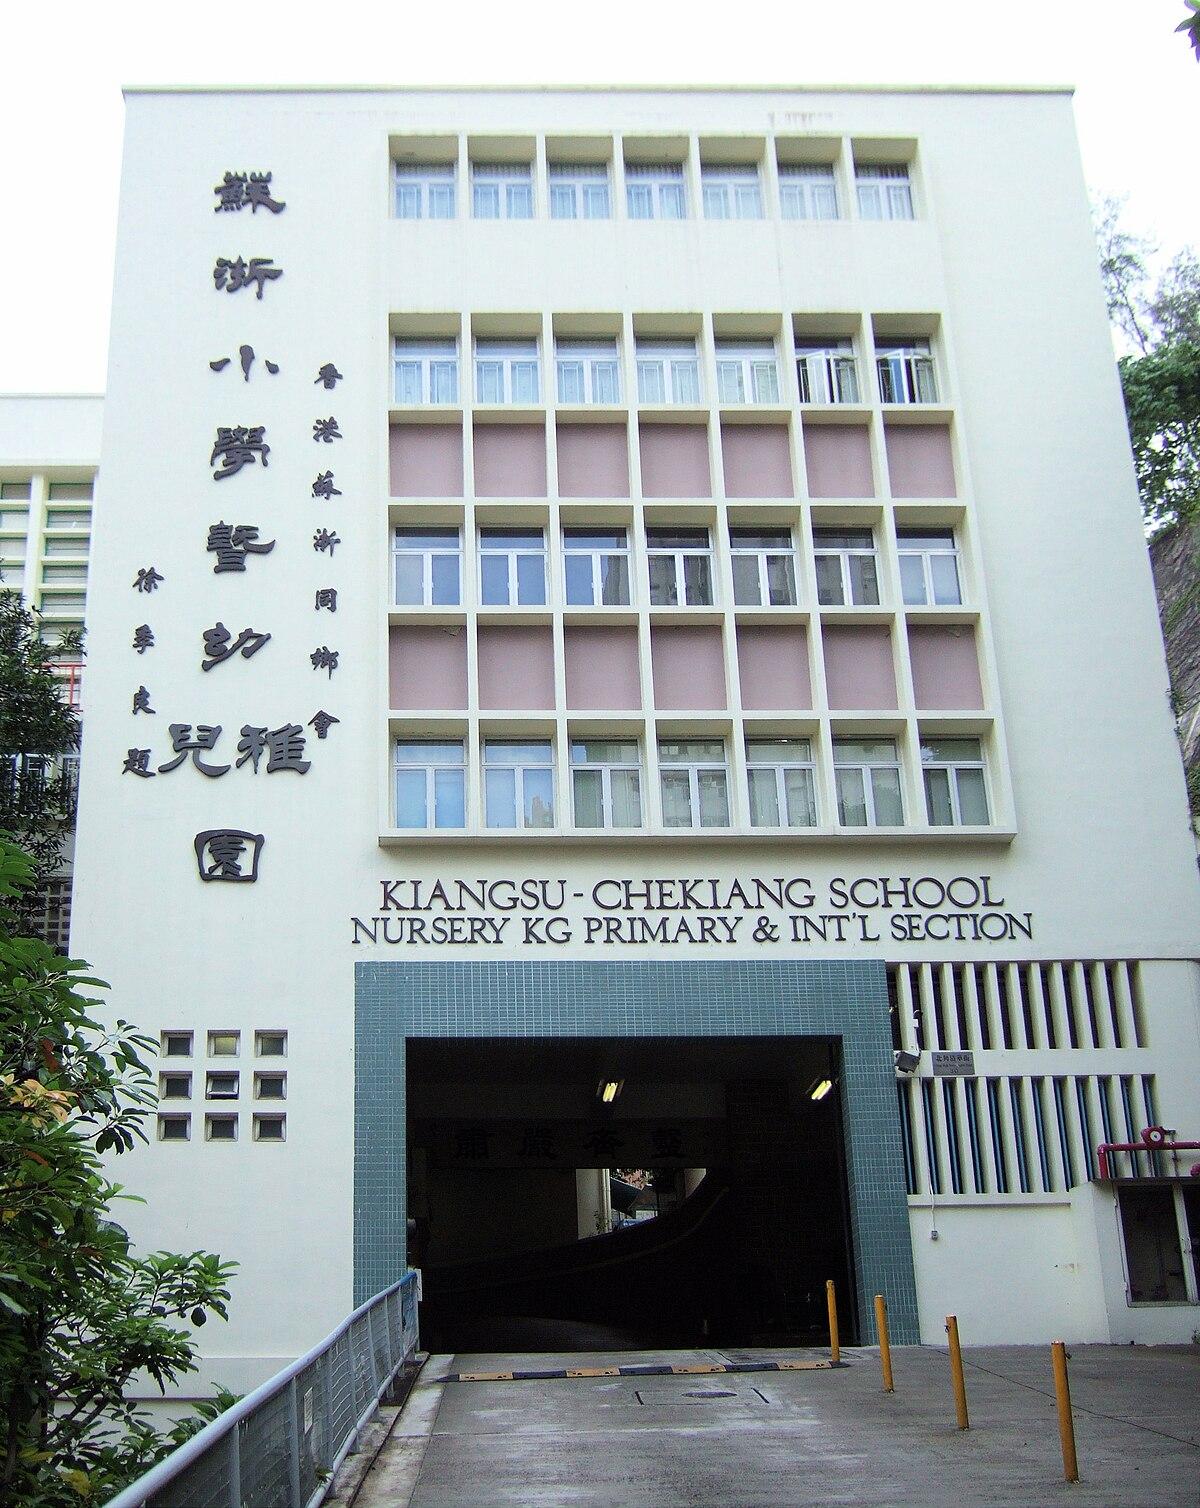 From Kindergarten To College >> Kiangsu and Chekiang Primary School - Wikipedia